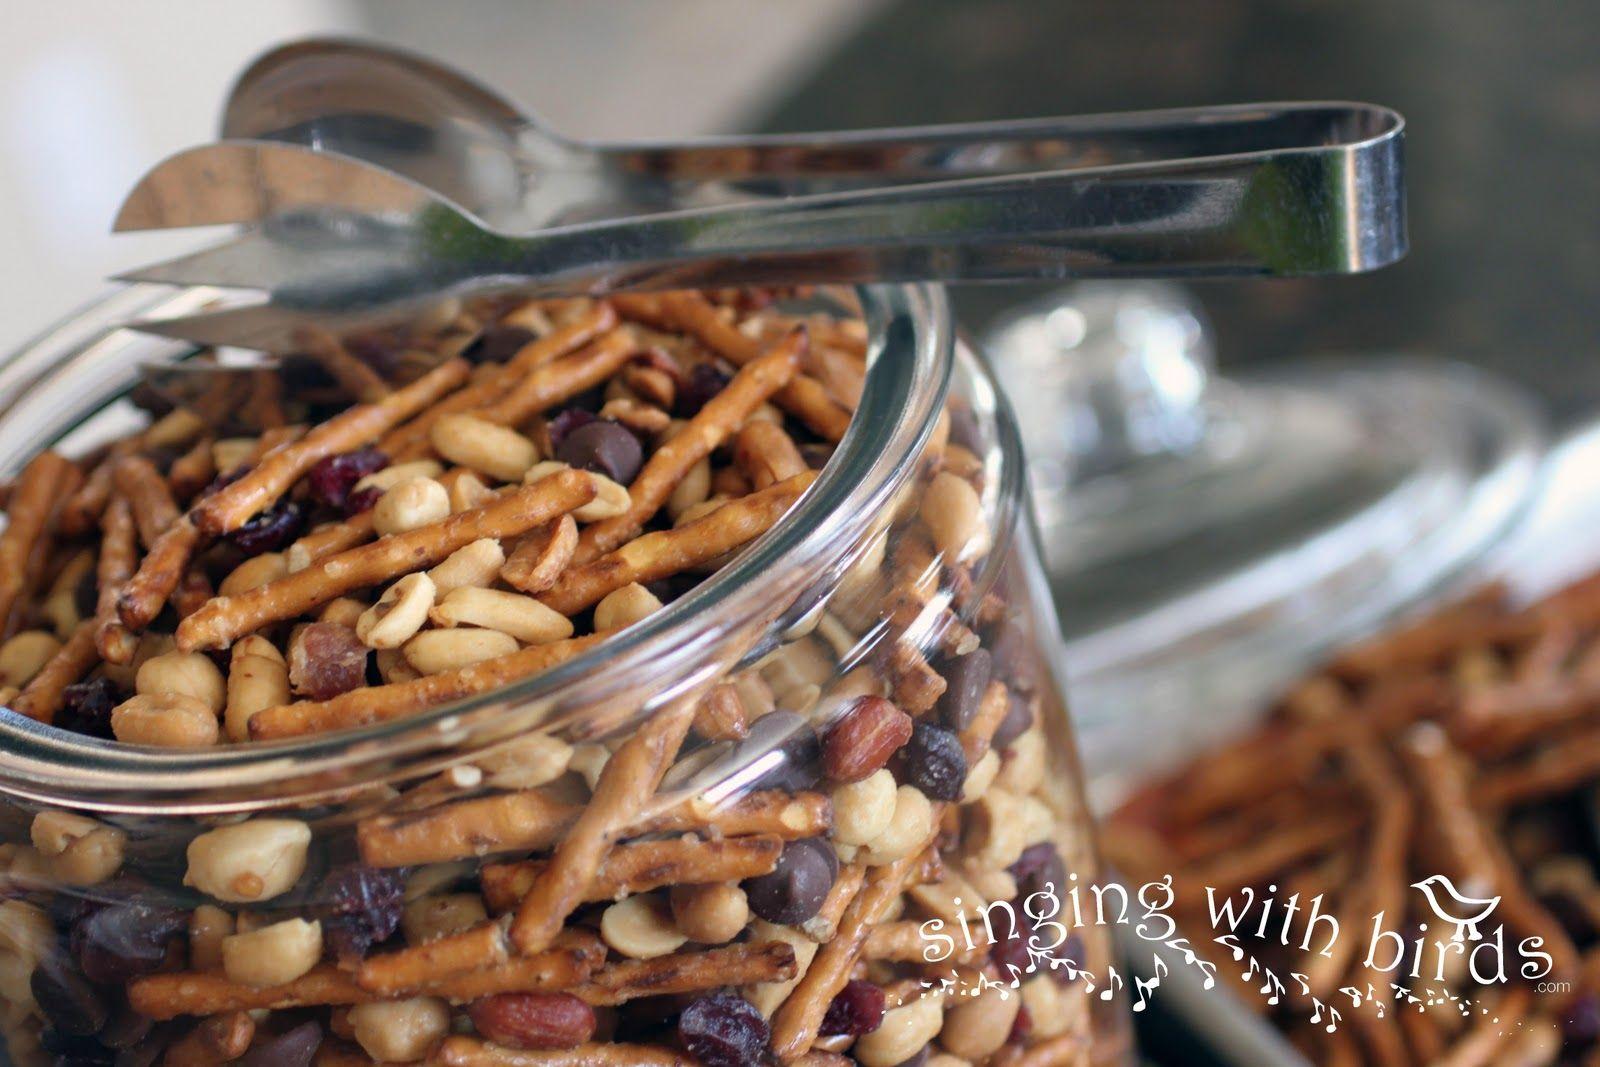 Maple Bacon Peanut Snack Mix Recipe - http://www.advancedlaserandskincenter.com/wp-content/uploads/2015/06/Maple-Bacon-Peanut-Snack-Mix.jpg - http://www.advancedlaserandskincenter.com/latest-news/maple-bacon-peanut-snack-mix-recipe/